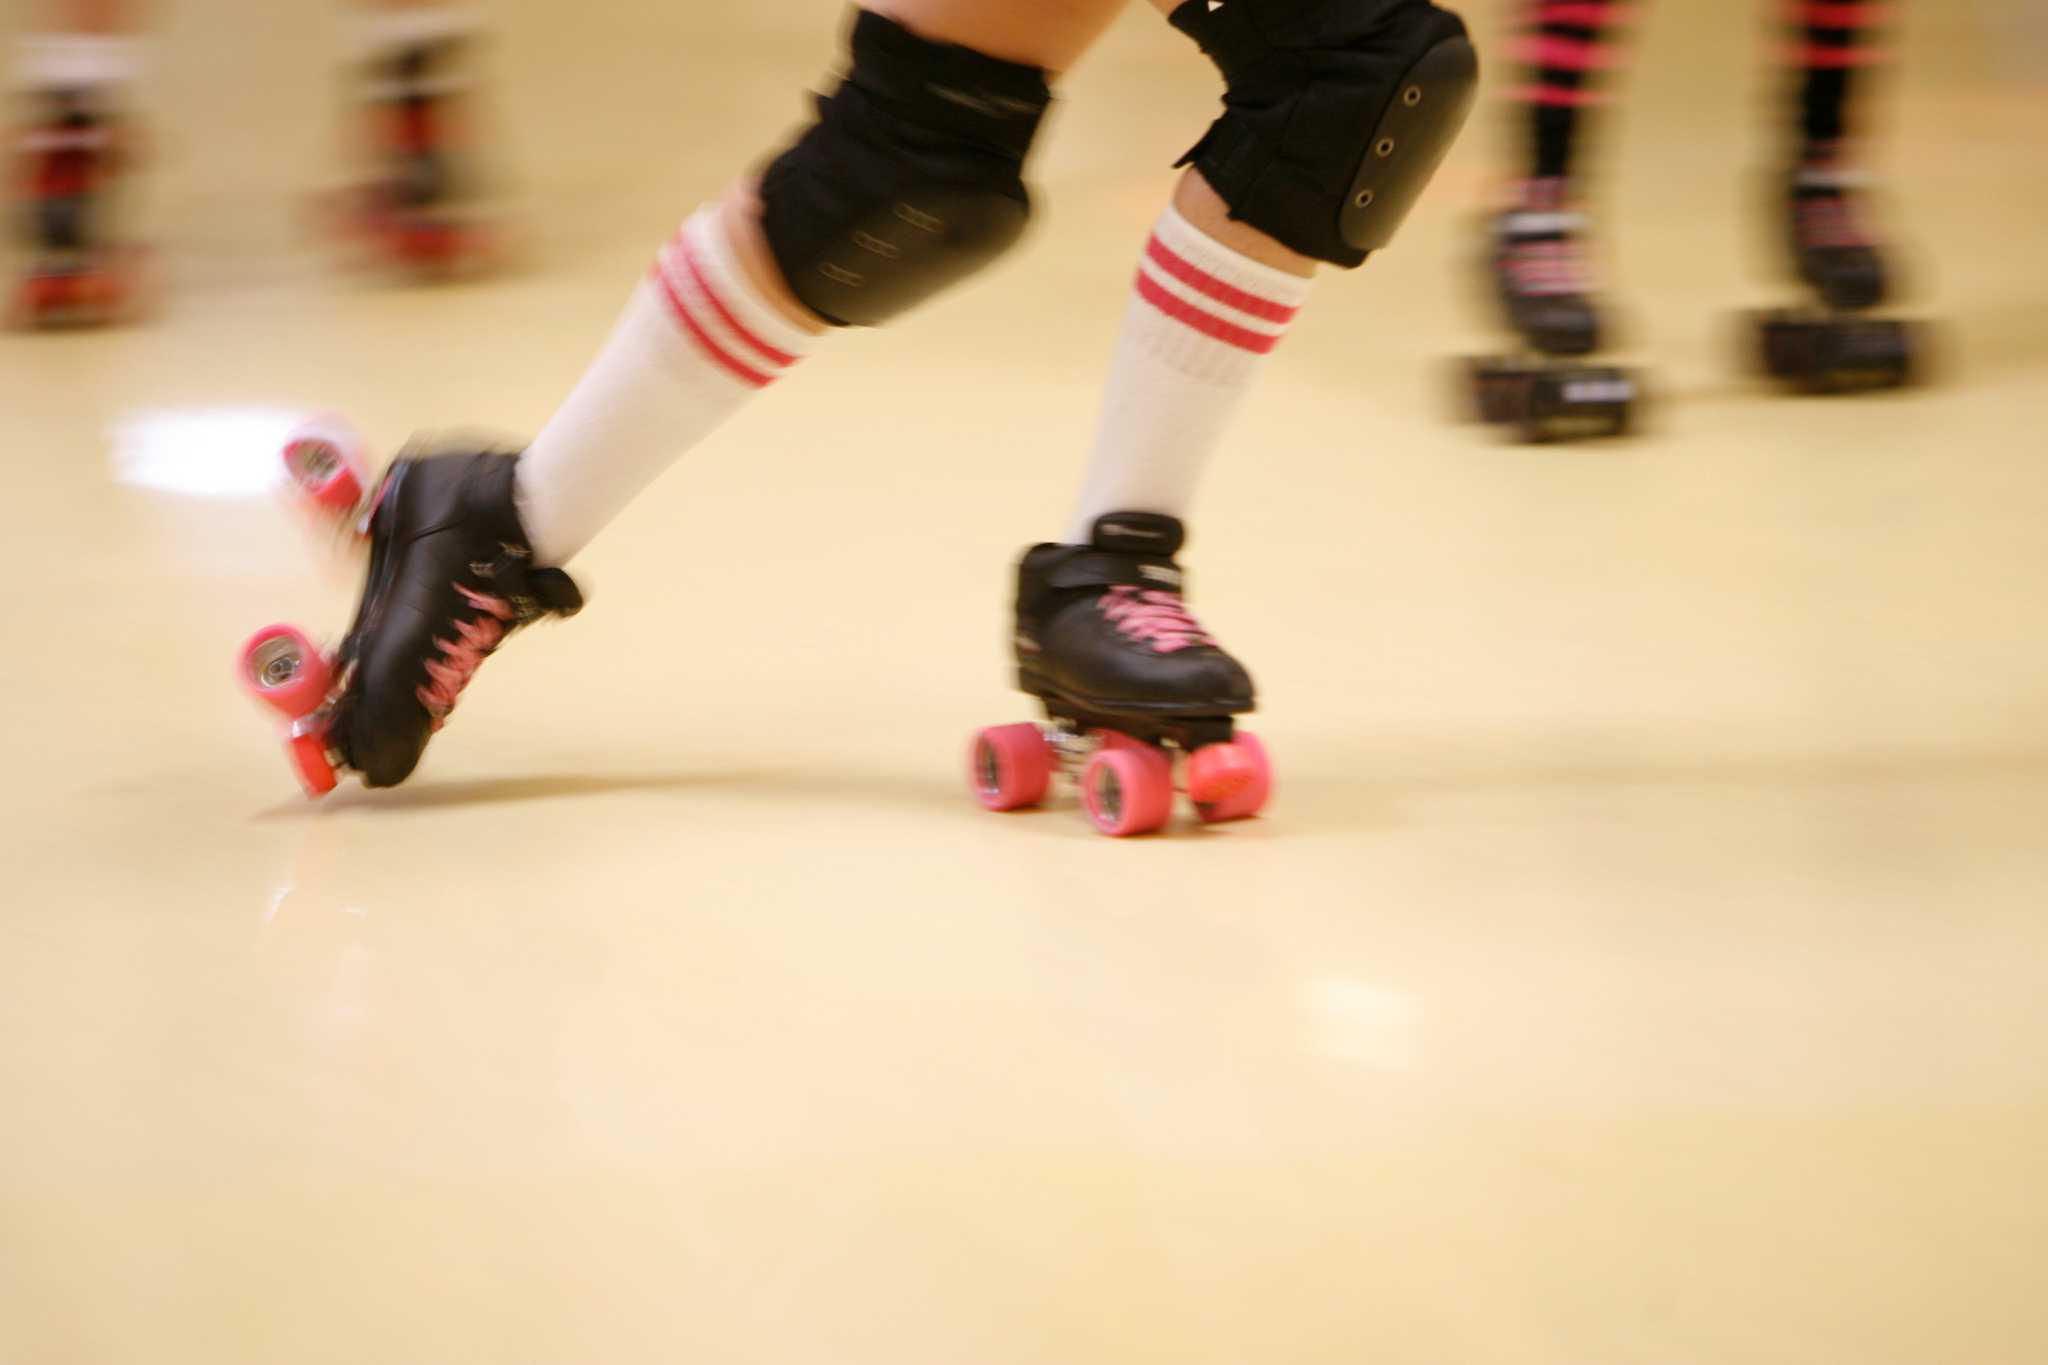 Roller skating houston - Roller Skating Houston 6